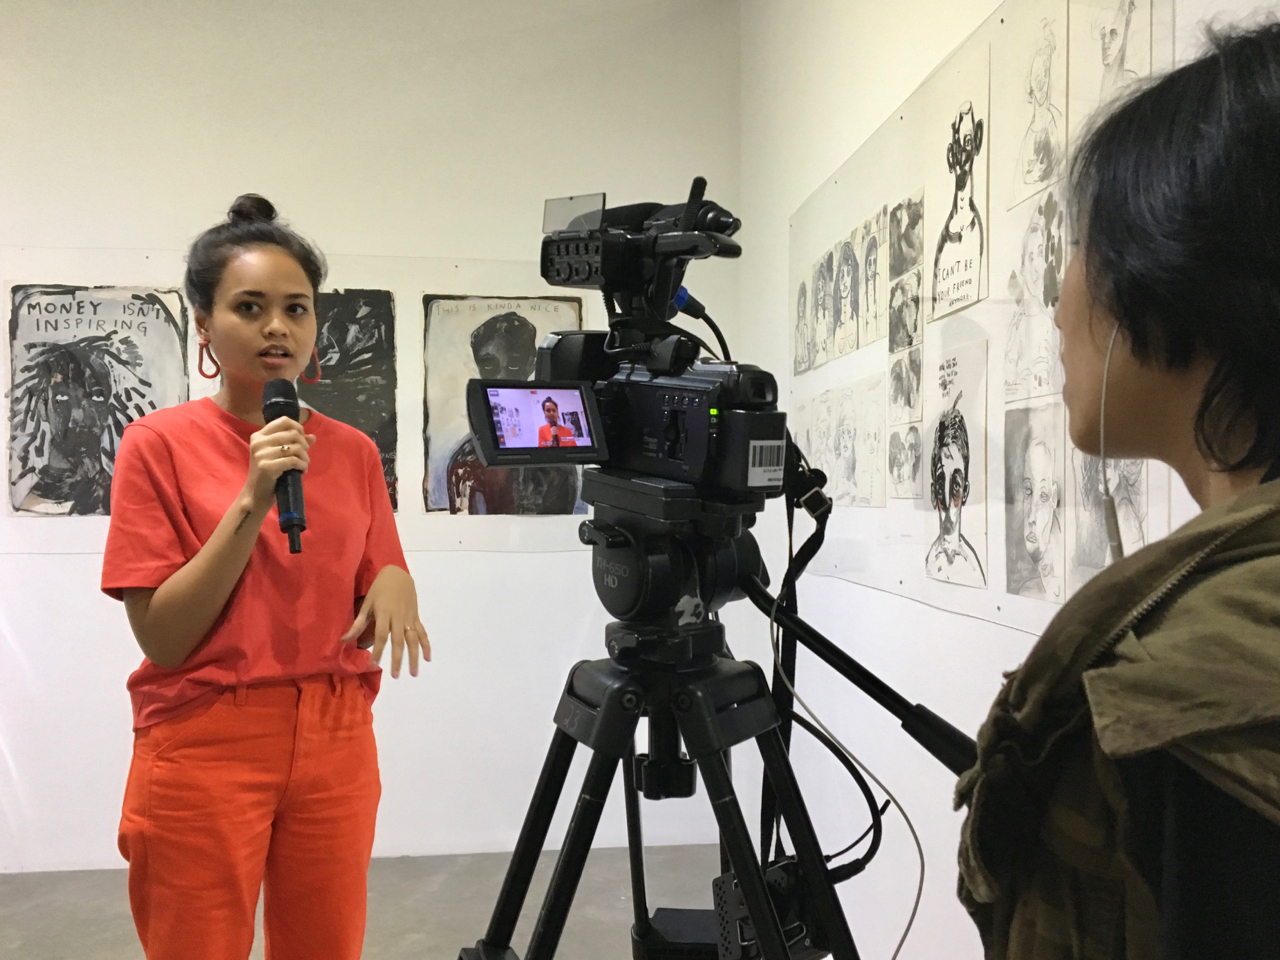 Natisa Jones speaks on Jakarta TV about her exhibition 'Grotesk' at Komunitas Salihara.